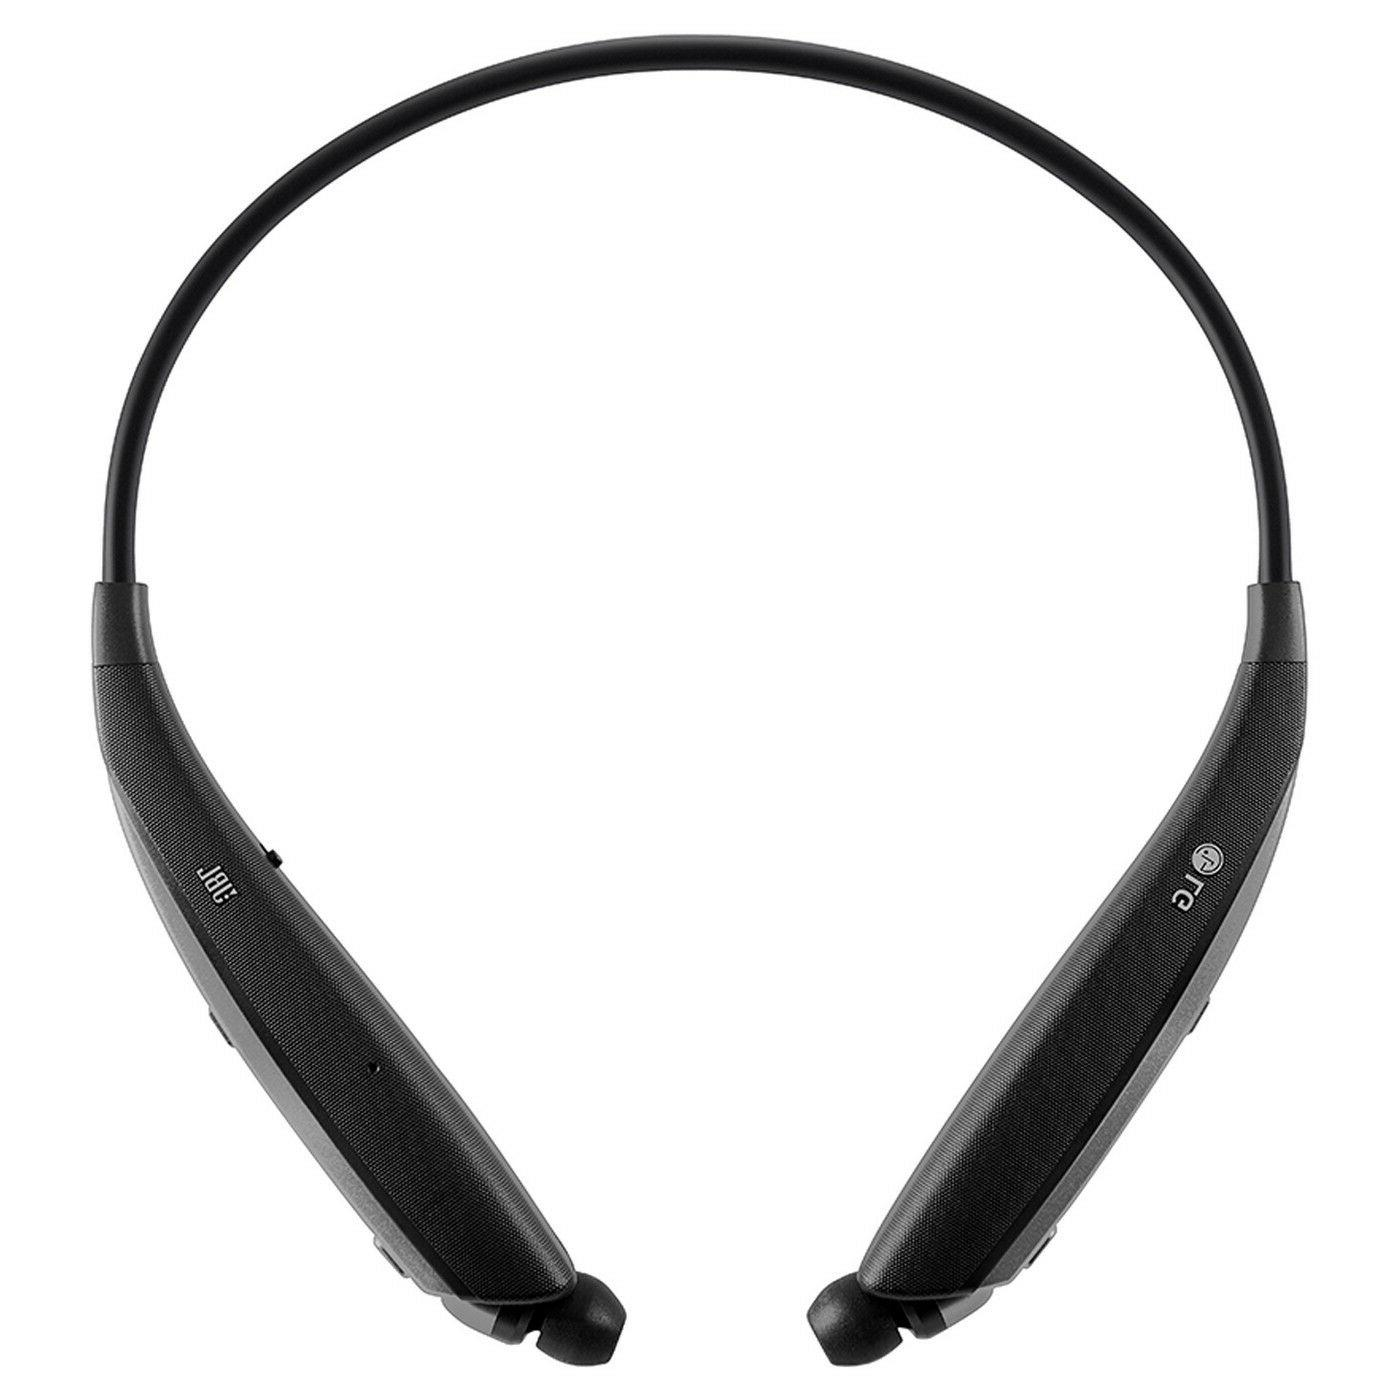 LG Tone Ultra HBS-820 Bluetooth Wireless Stereo Headset - Bl